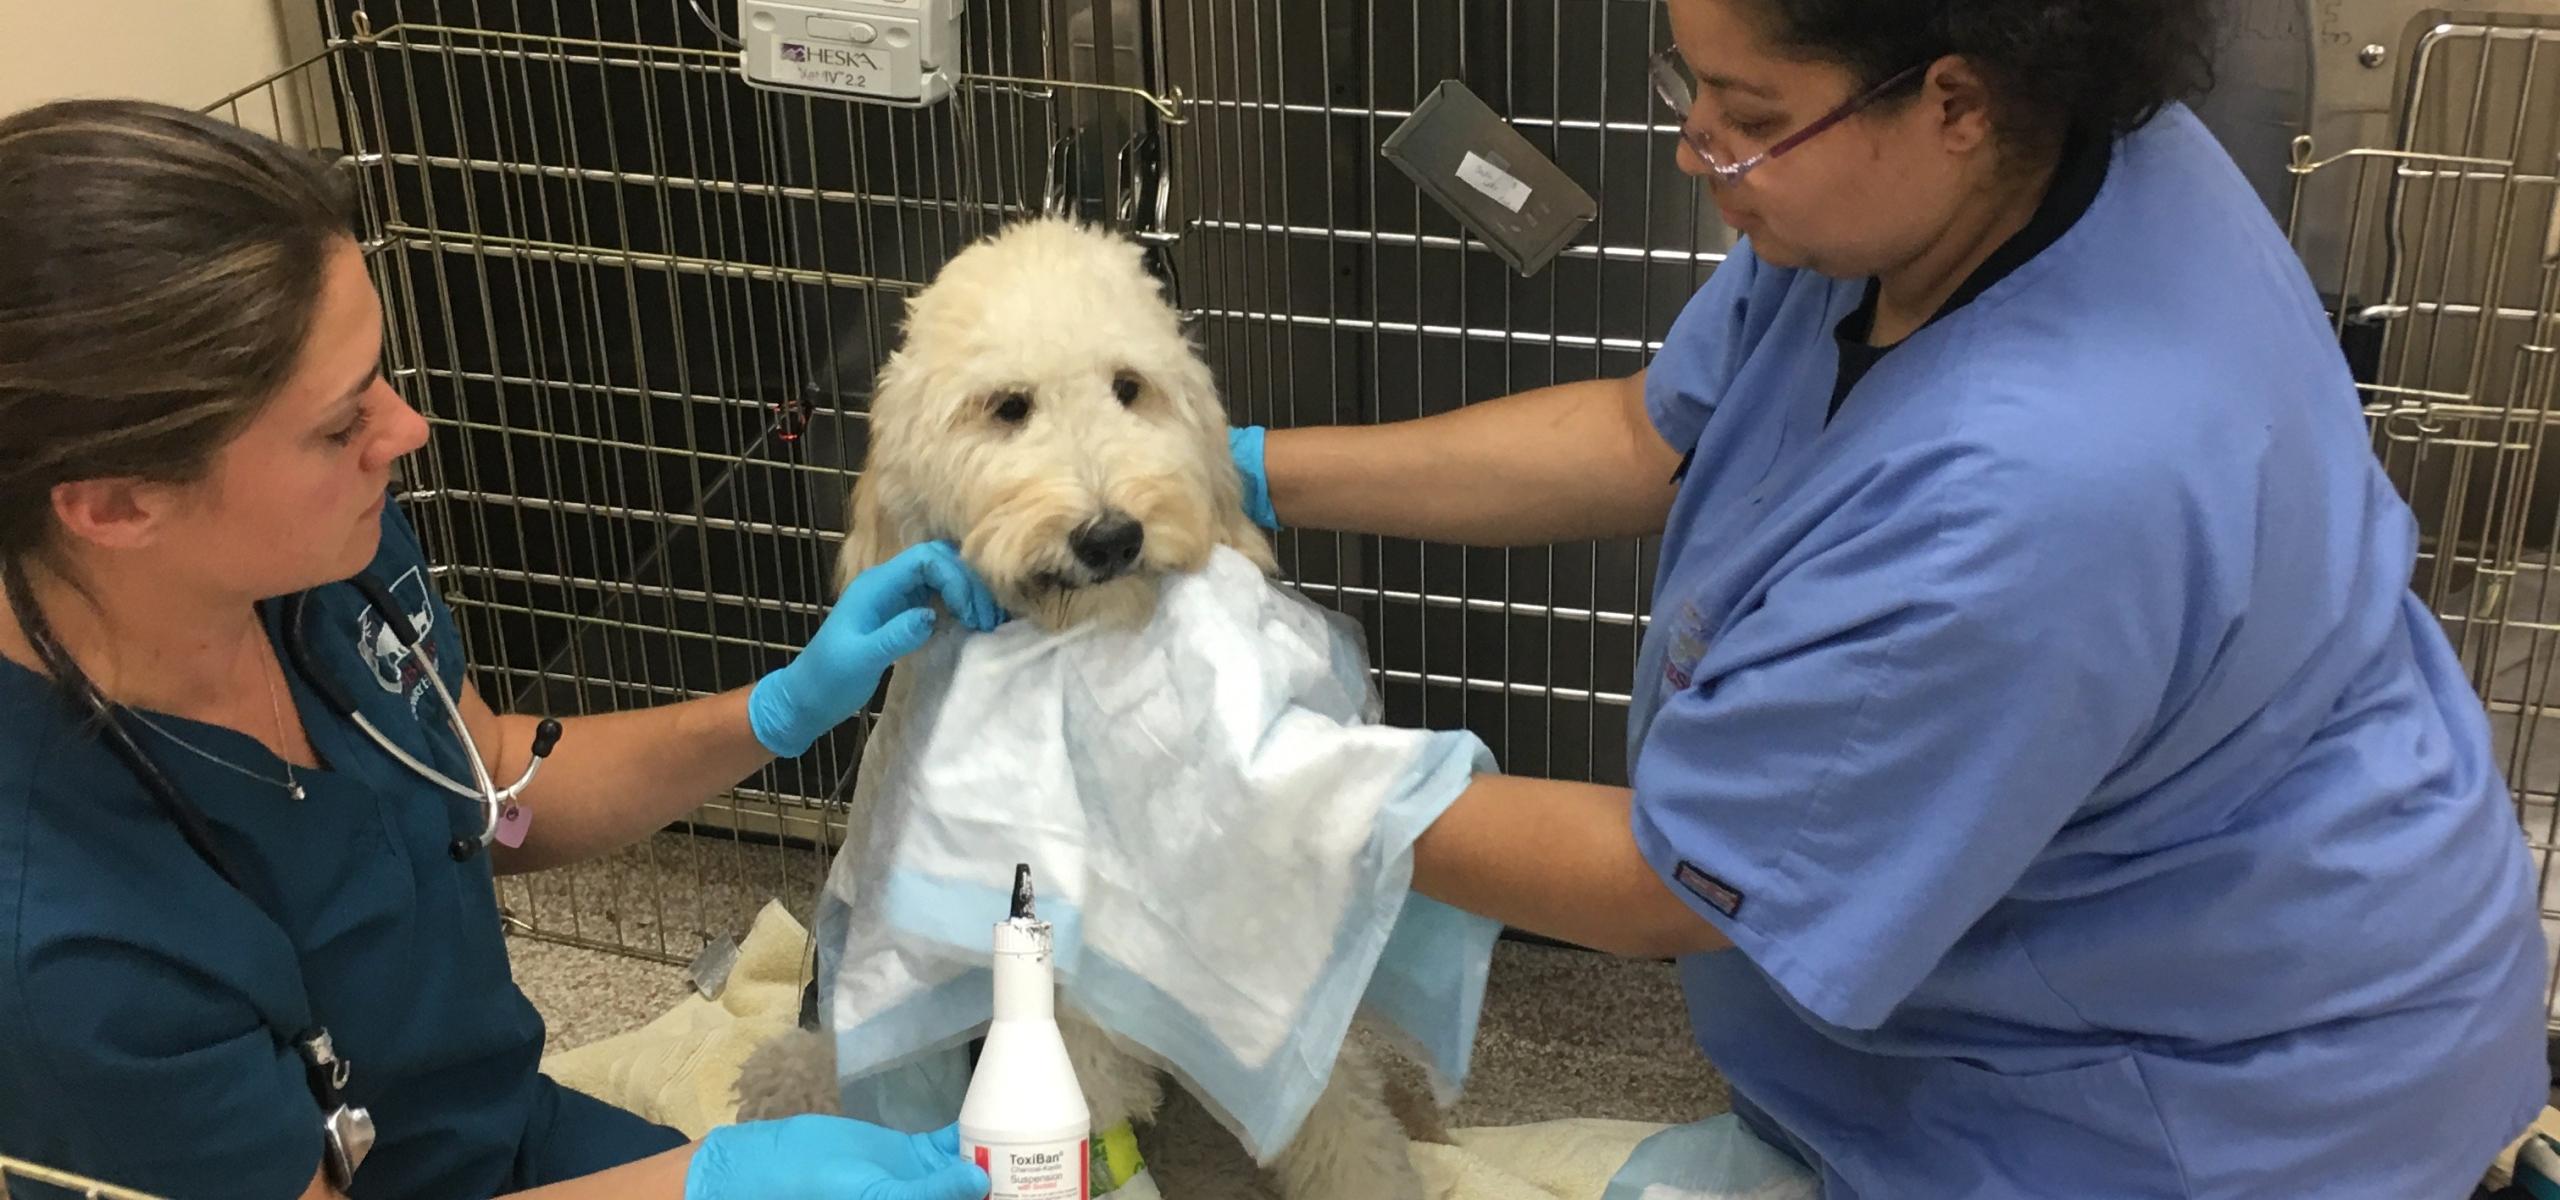 Treating medication poisoning in dogs - Leesburg Veterinary Hospital